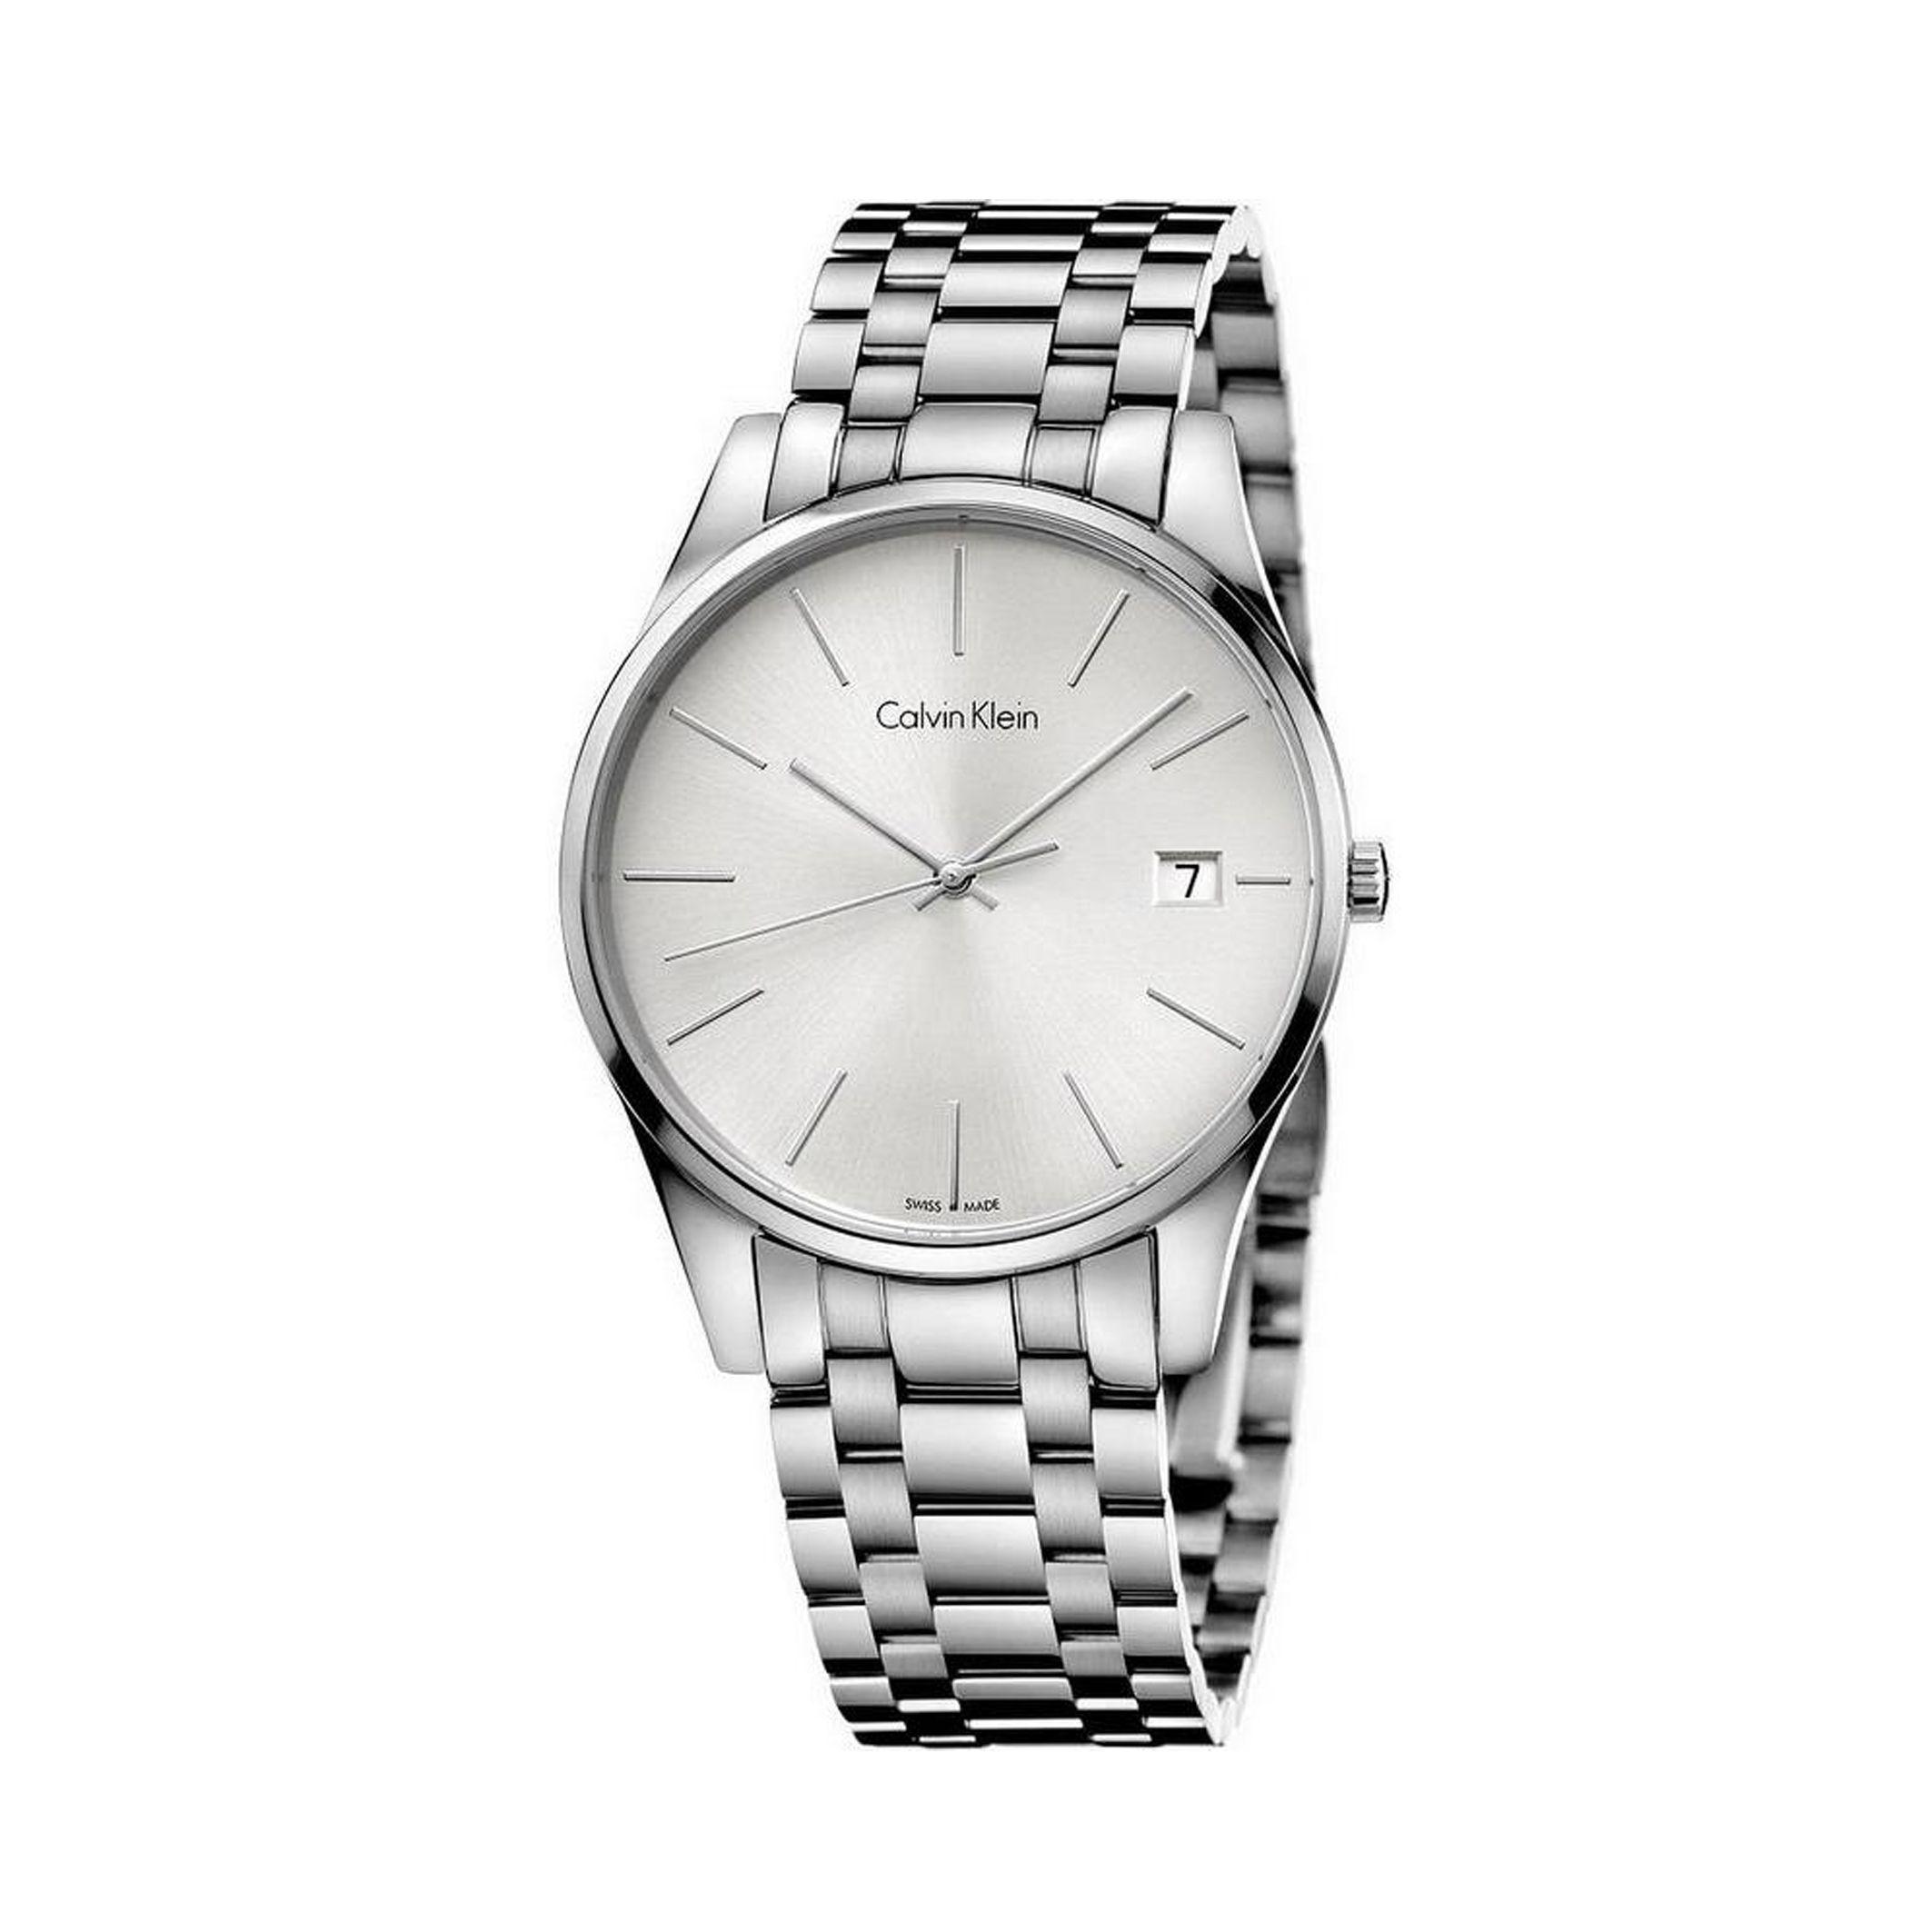 Calvin Klein – TIME_K4N21